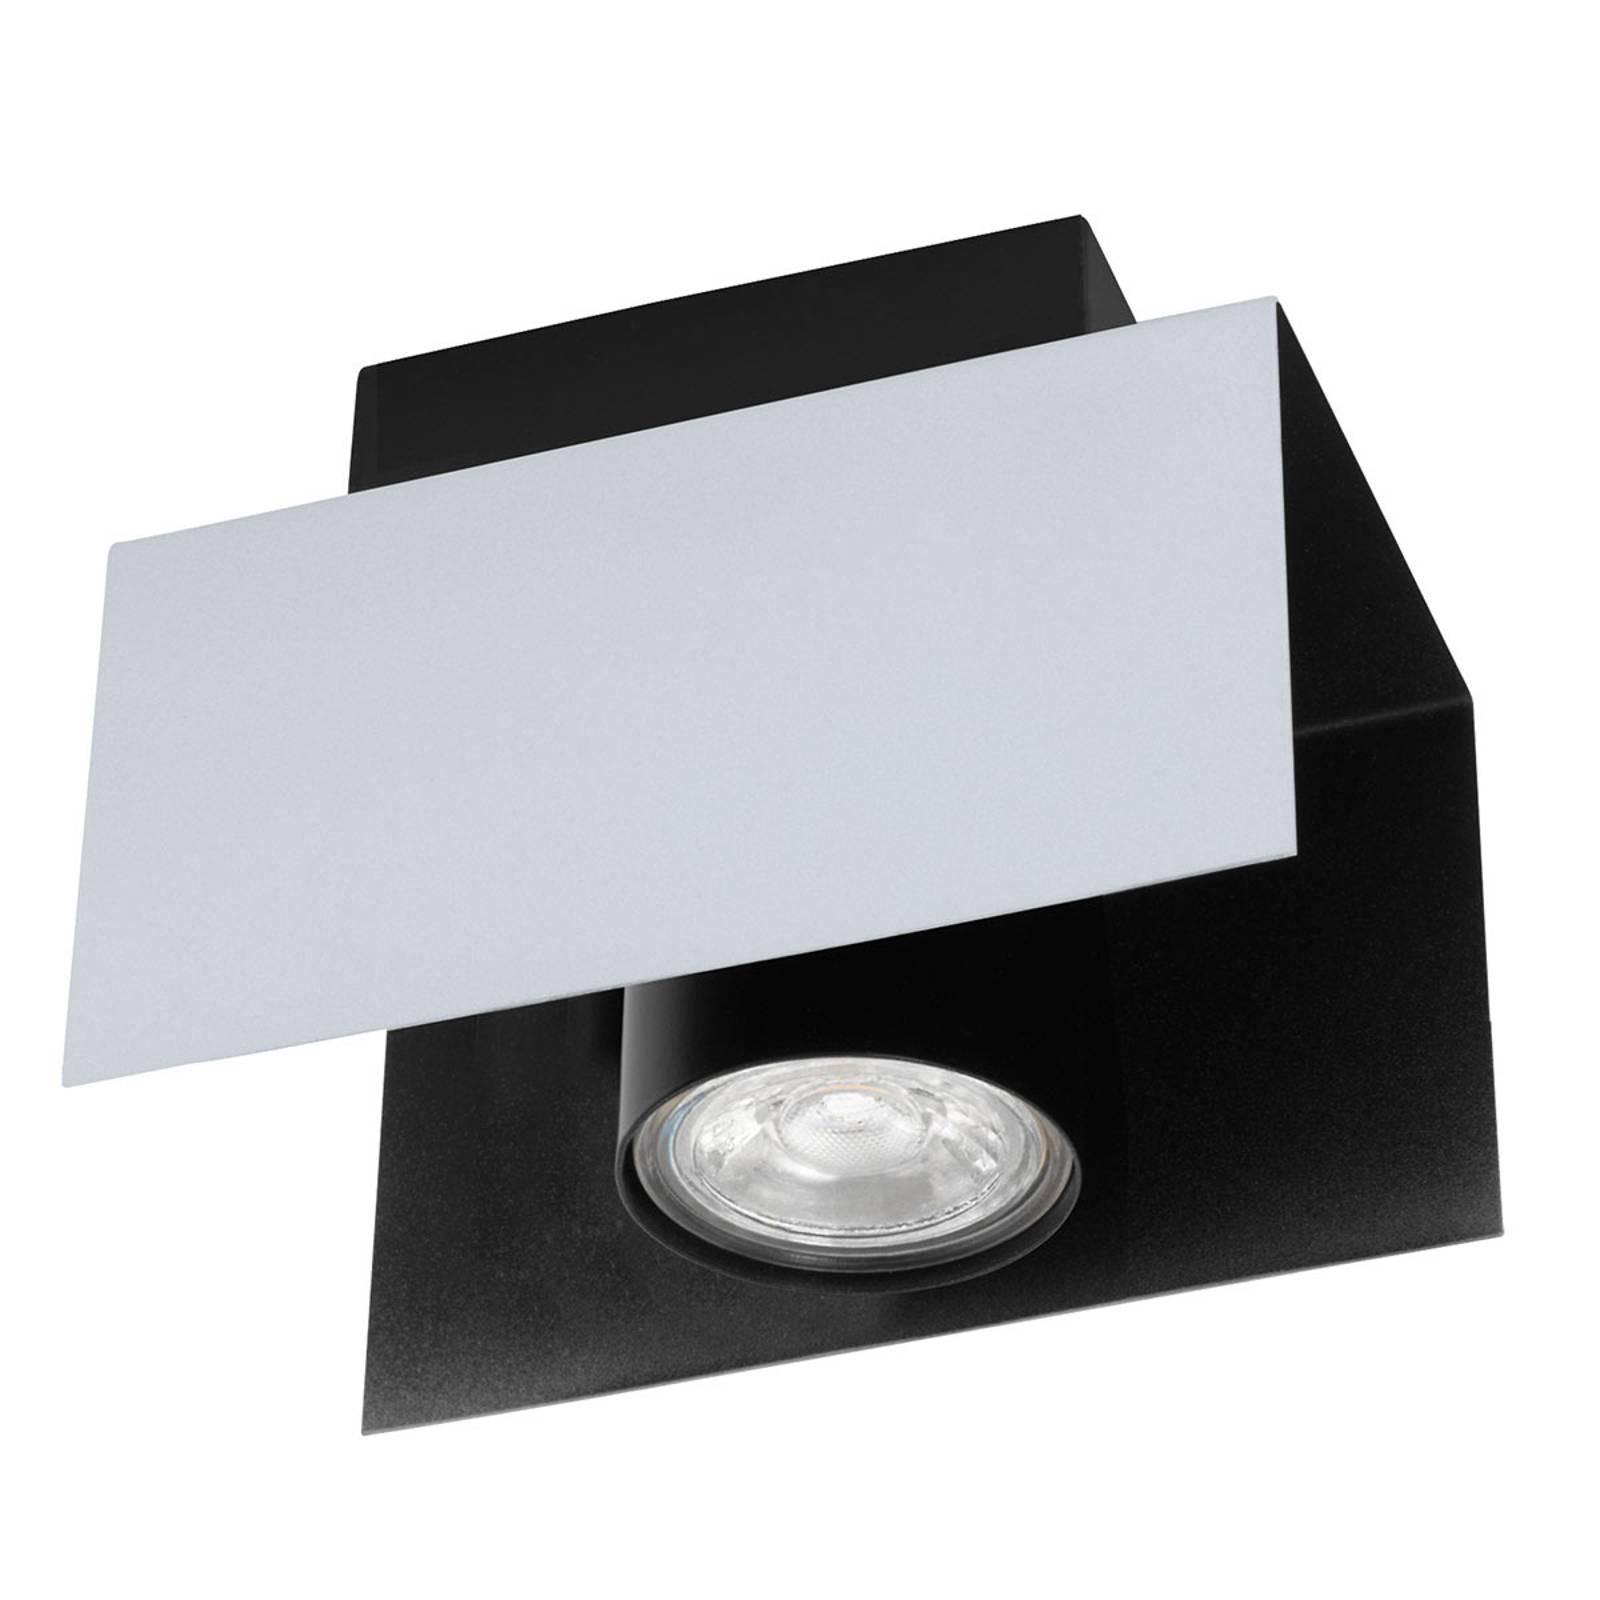 LED-kattovalaisin Viserba 12 cm